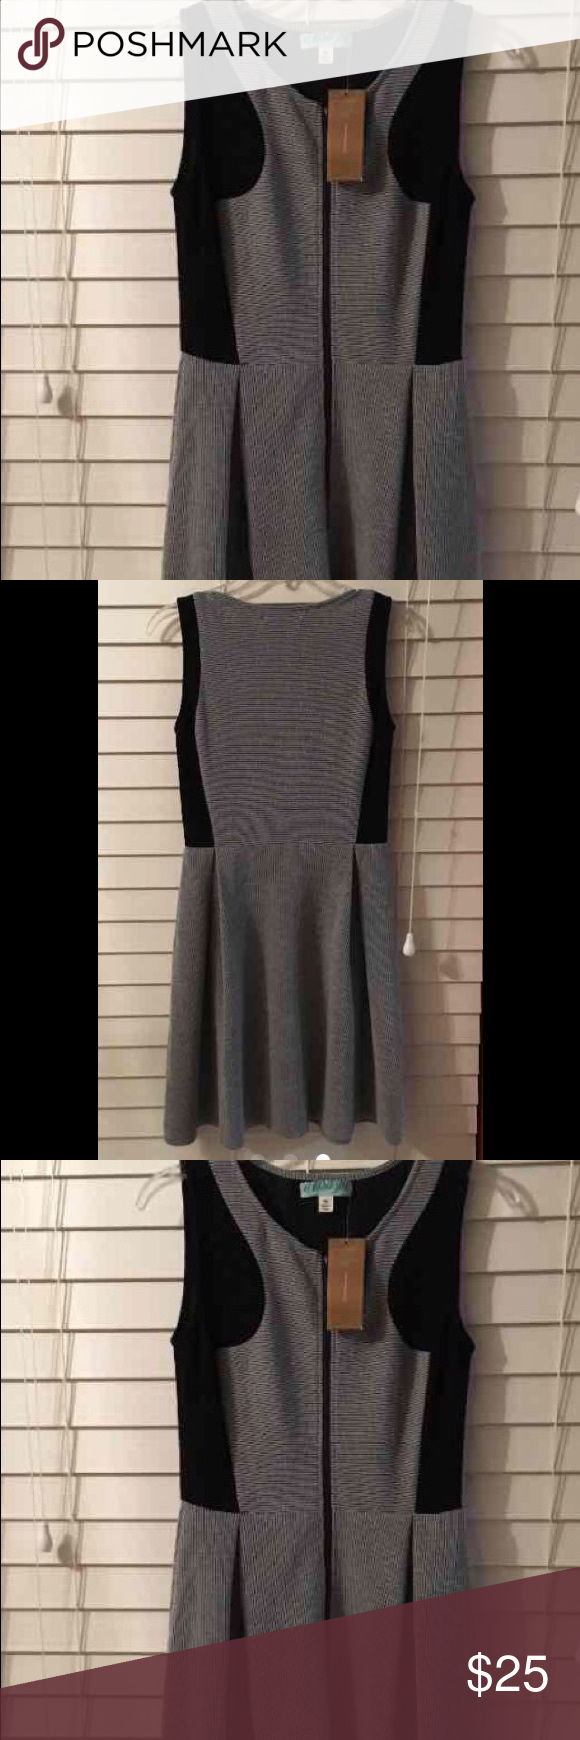 NWT sleeveless black/gray dress medium NWT sleeveless zip up front  dress black/gray. Hits right at knee Dresses Midi